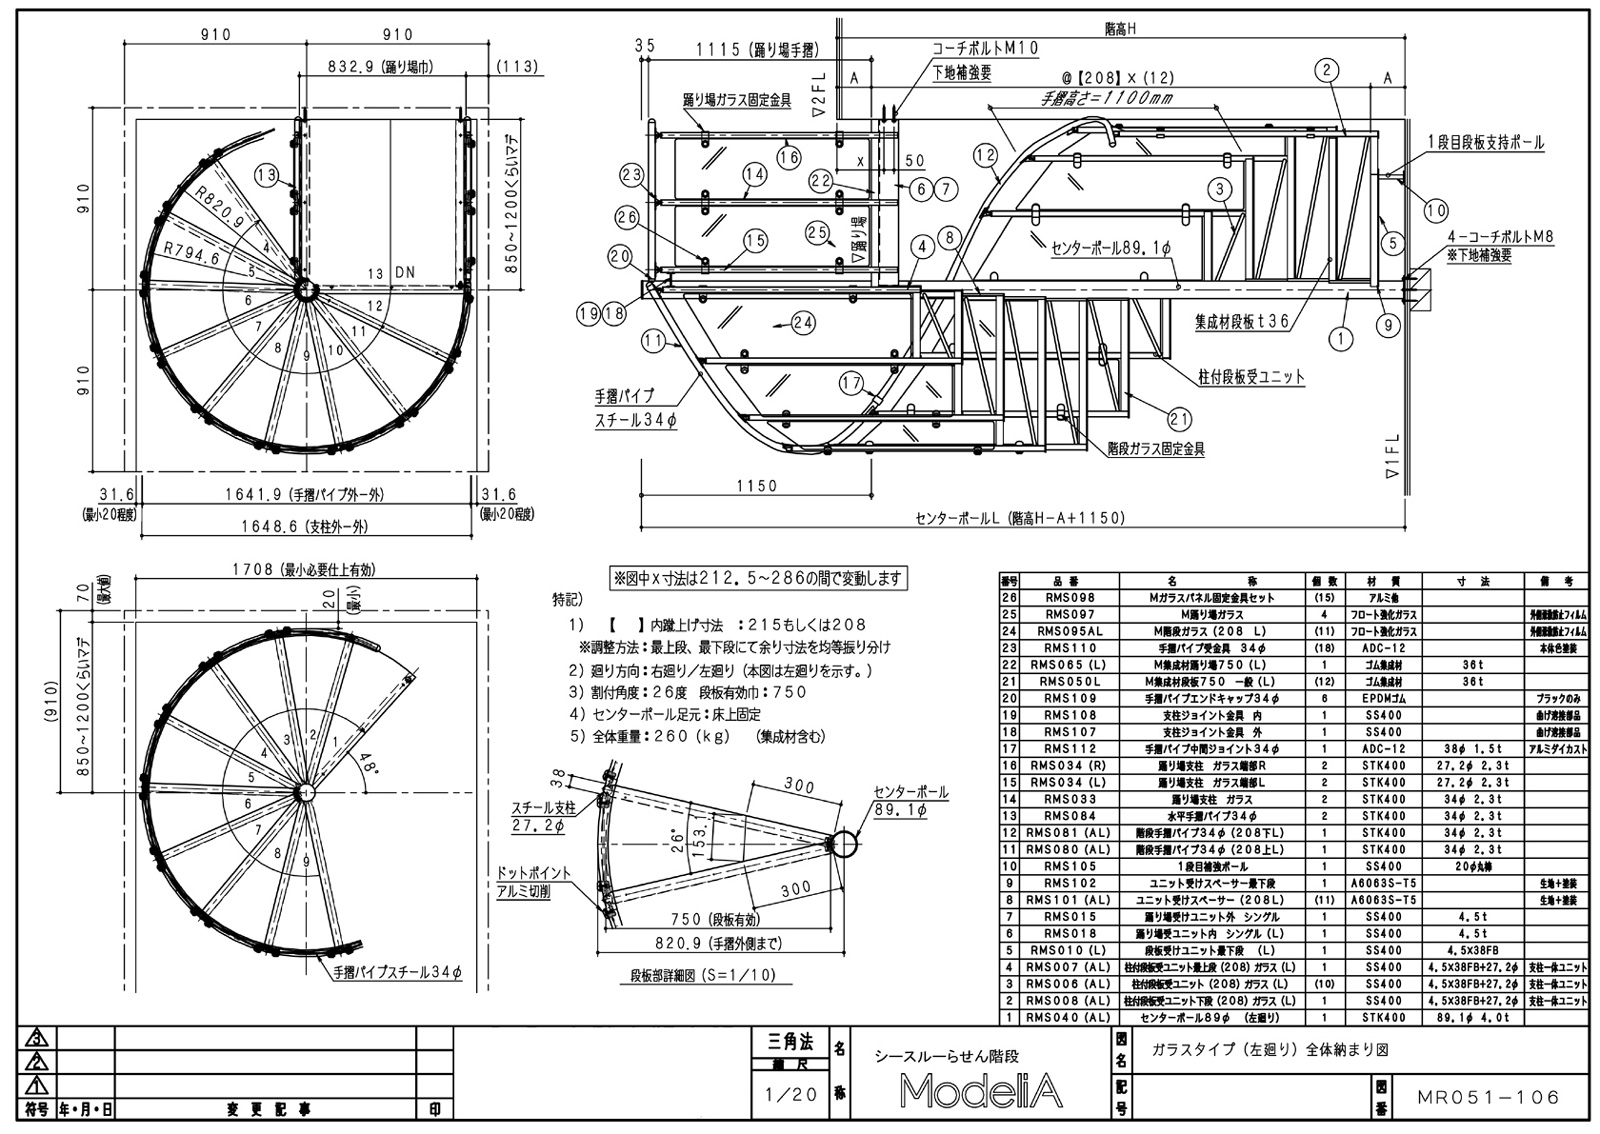 t up2007 indoor steel spiral staircase glass. Black Bedroom Furniture Sets. Home Design Ideas